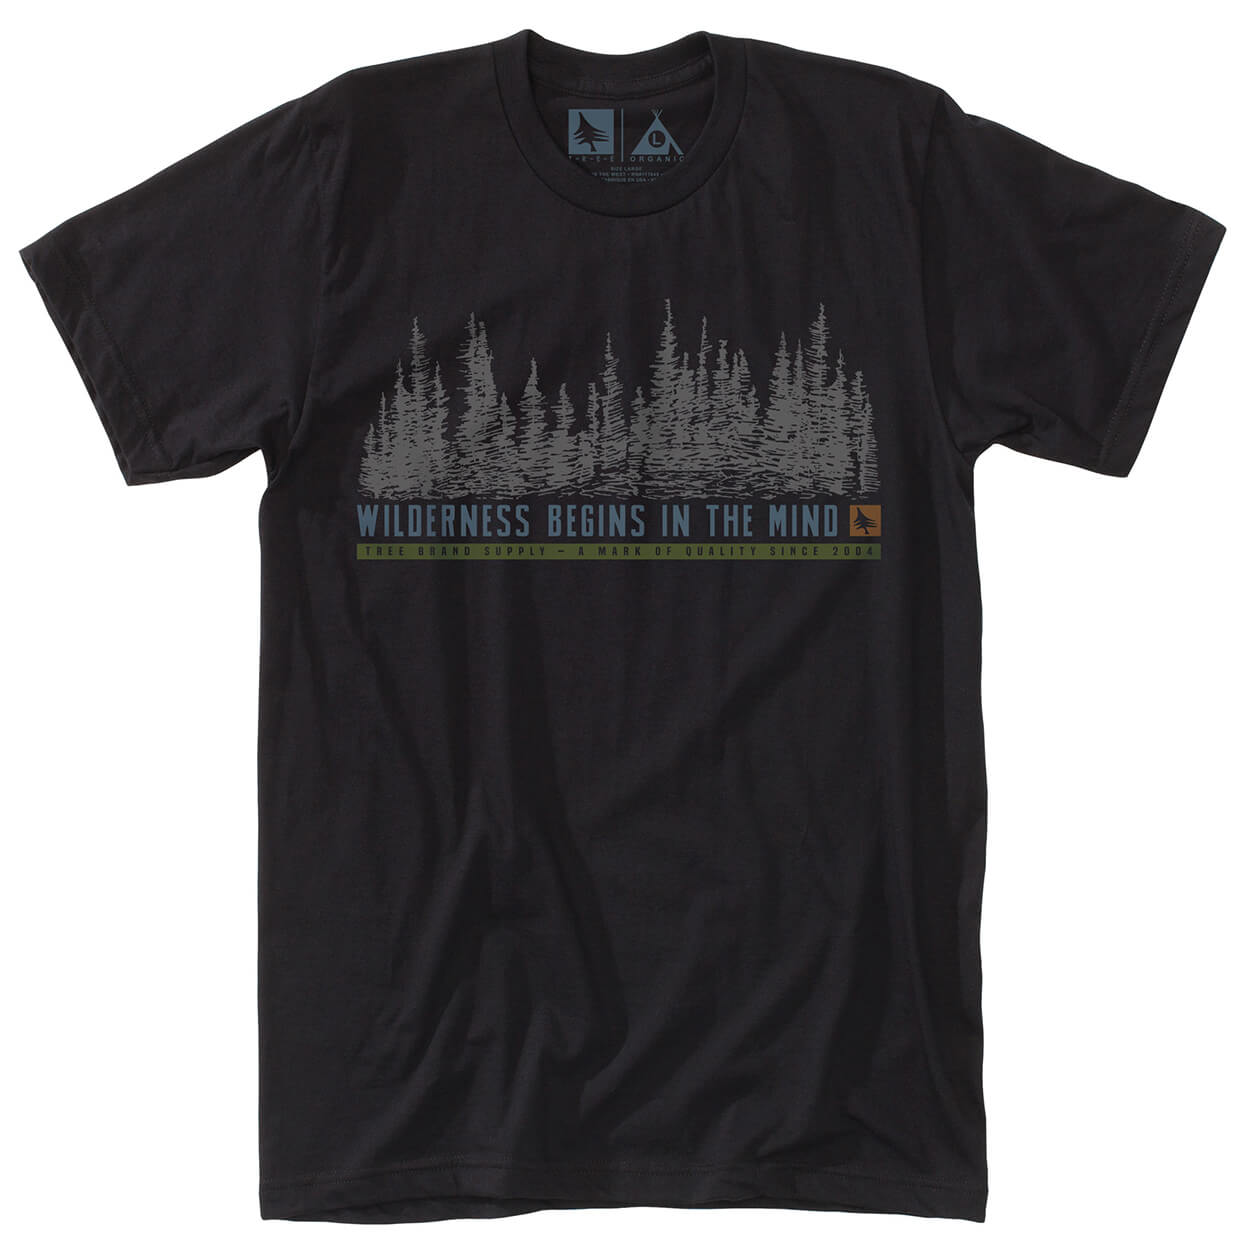 Hippy tree woodside tee t shirt homme achat en ligne for Hippie t shirts australia